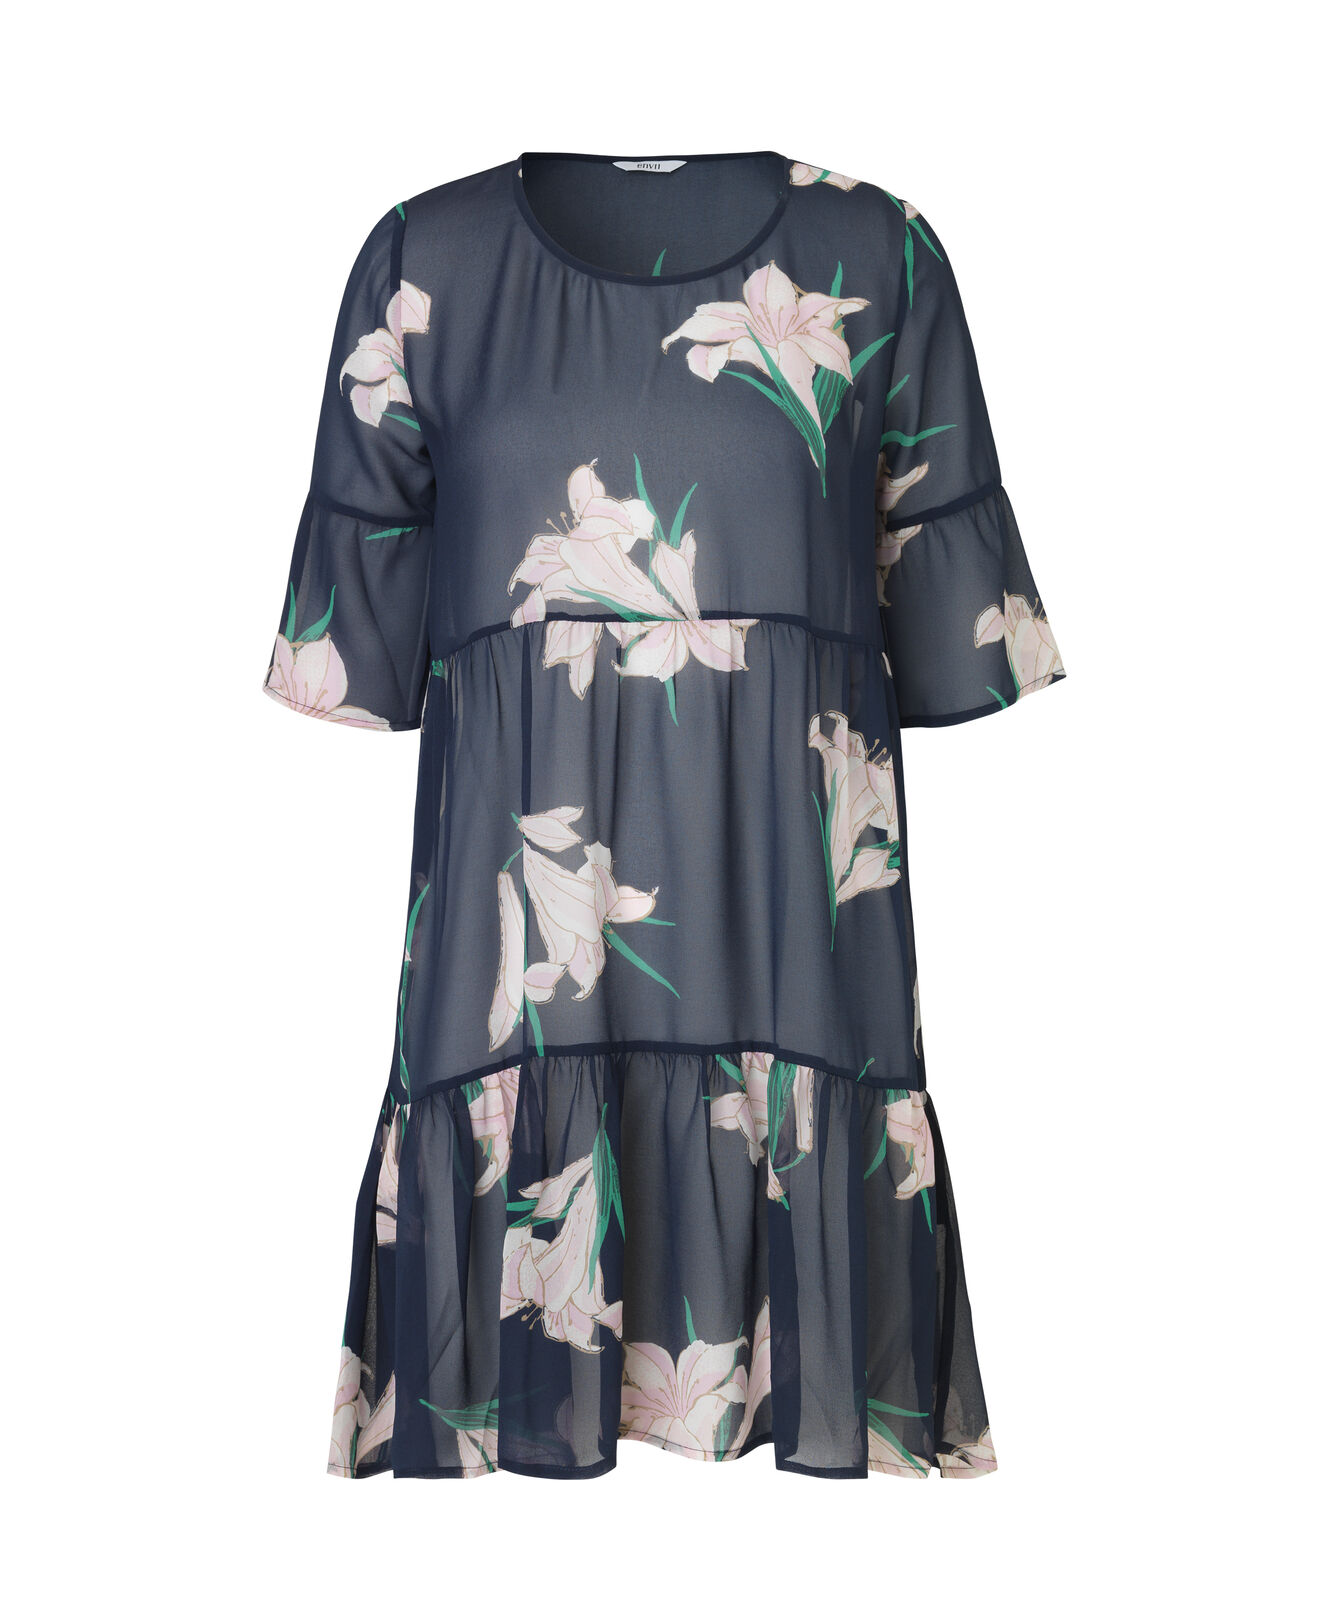 ENMOANA 3/4 DRESS AOP 6395, LILY AOP